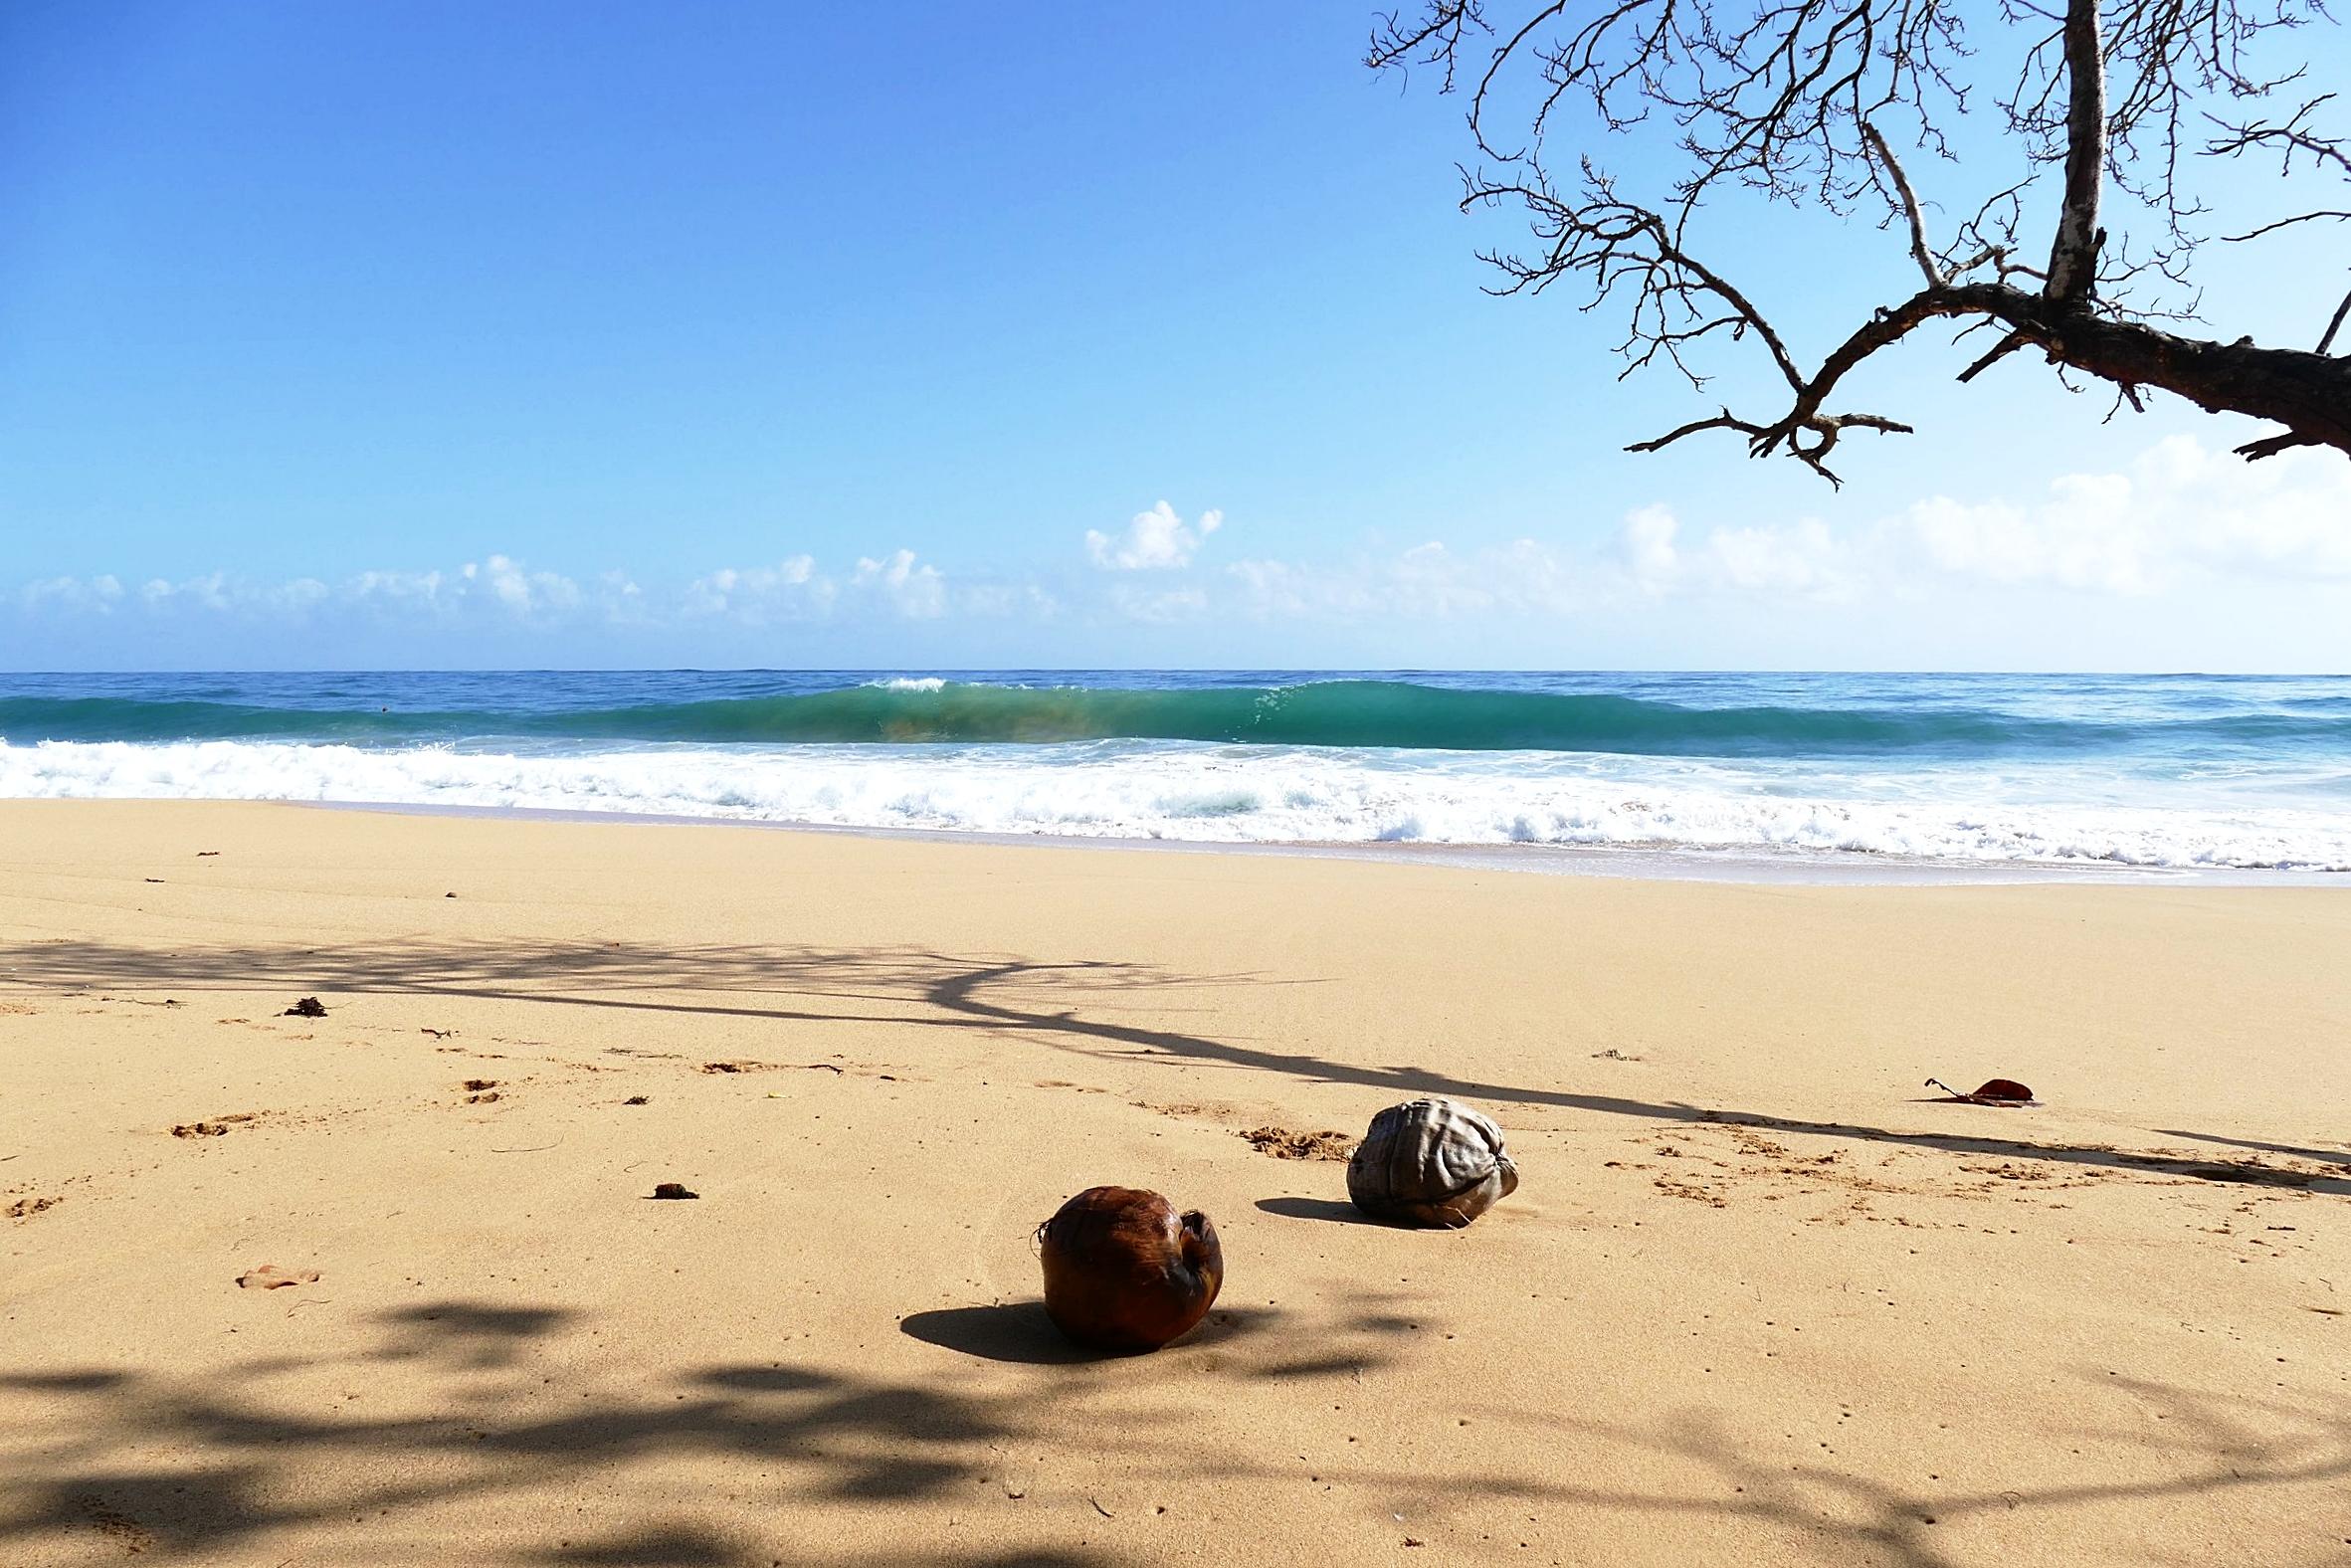 Playa Bluff, Isla Colon, Bocas del Toro